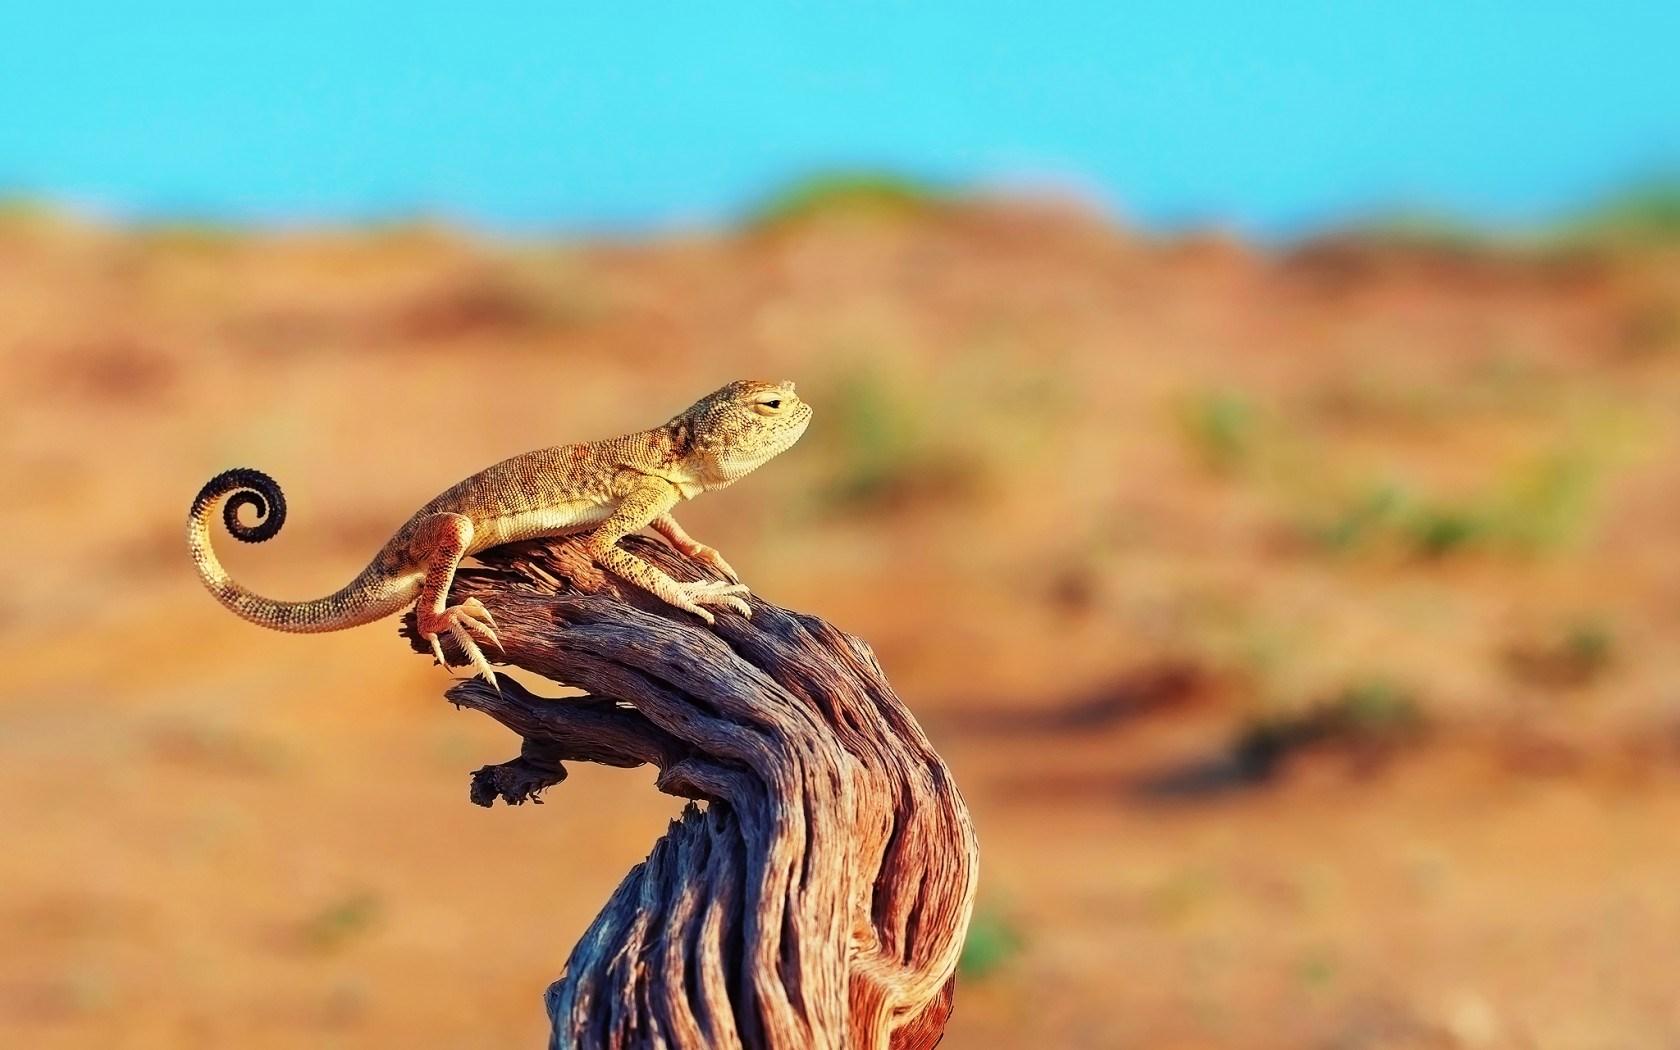 Cool Nature Wallpapers 3d Lizard Wild Hd Desktop Wallpapers 4k Hd